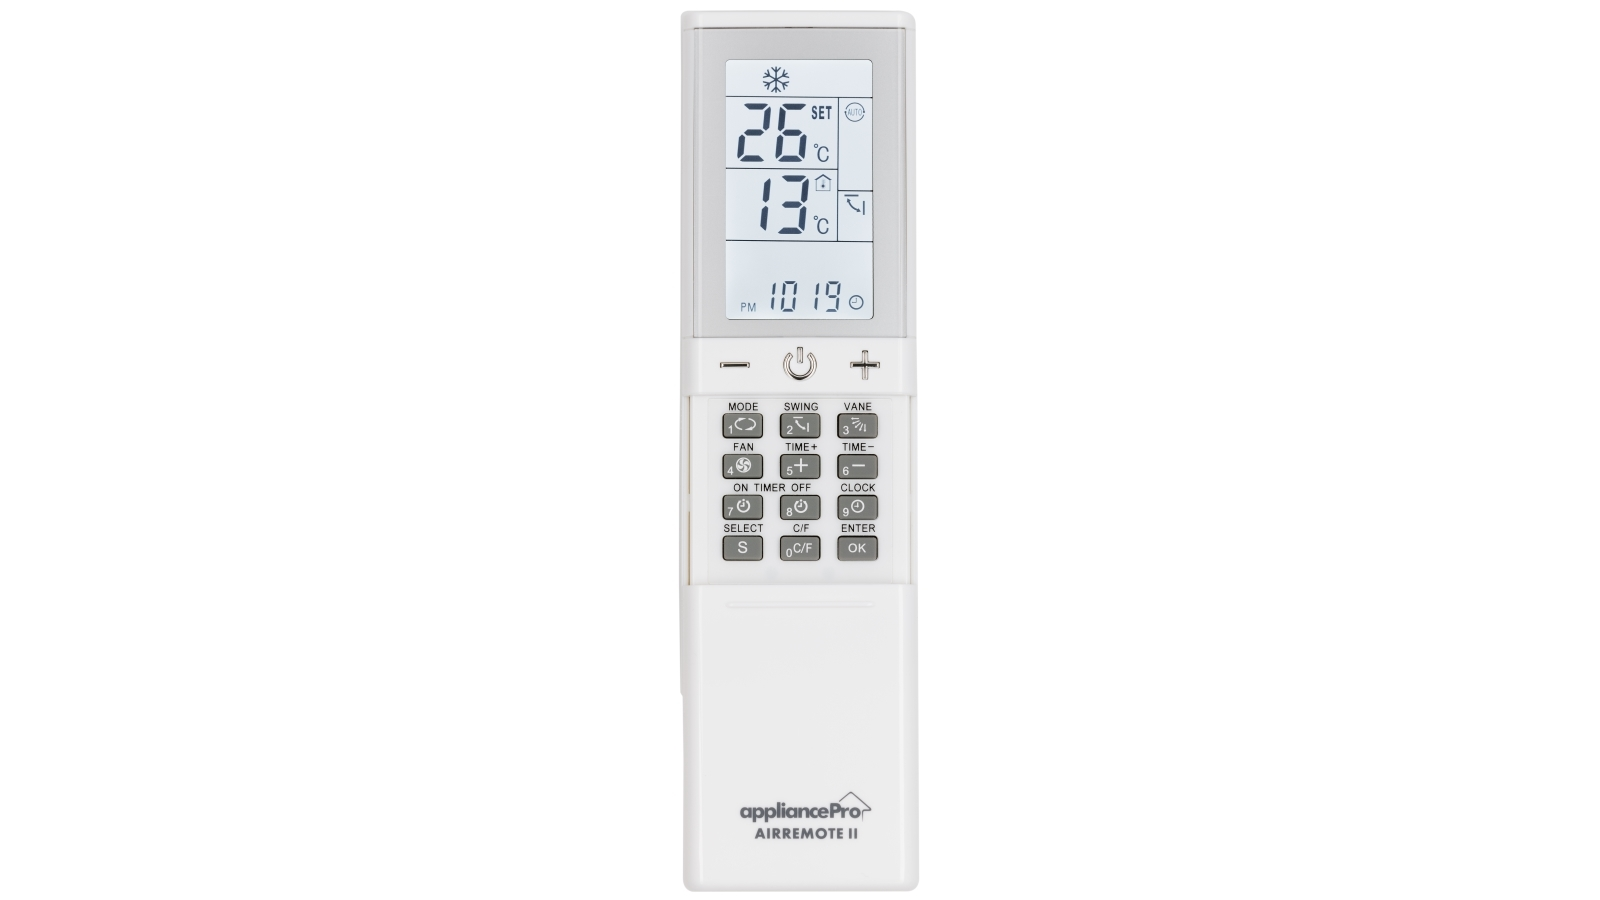 AppliancePro Universal Air Conditioner Remote Control